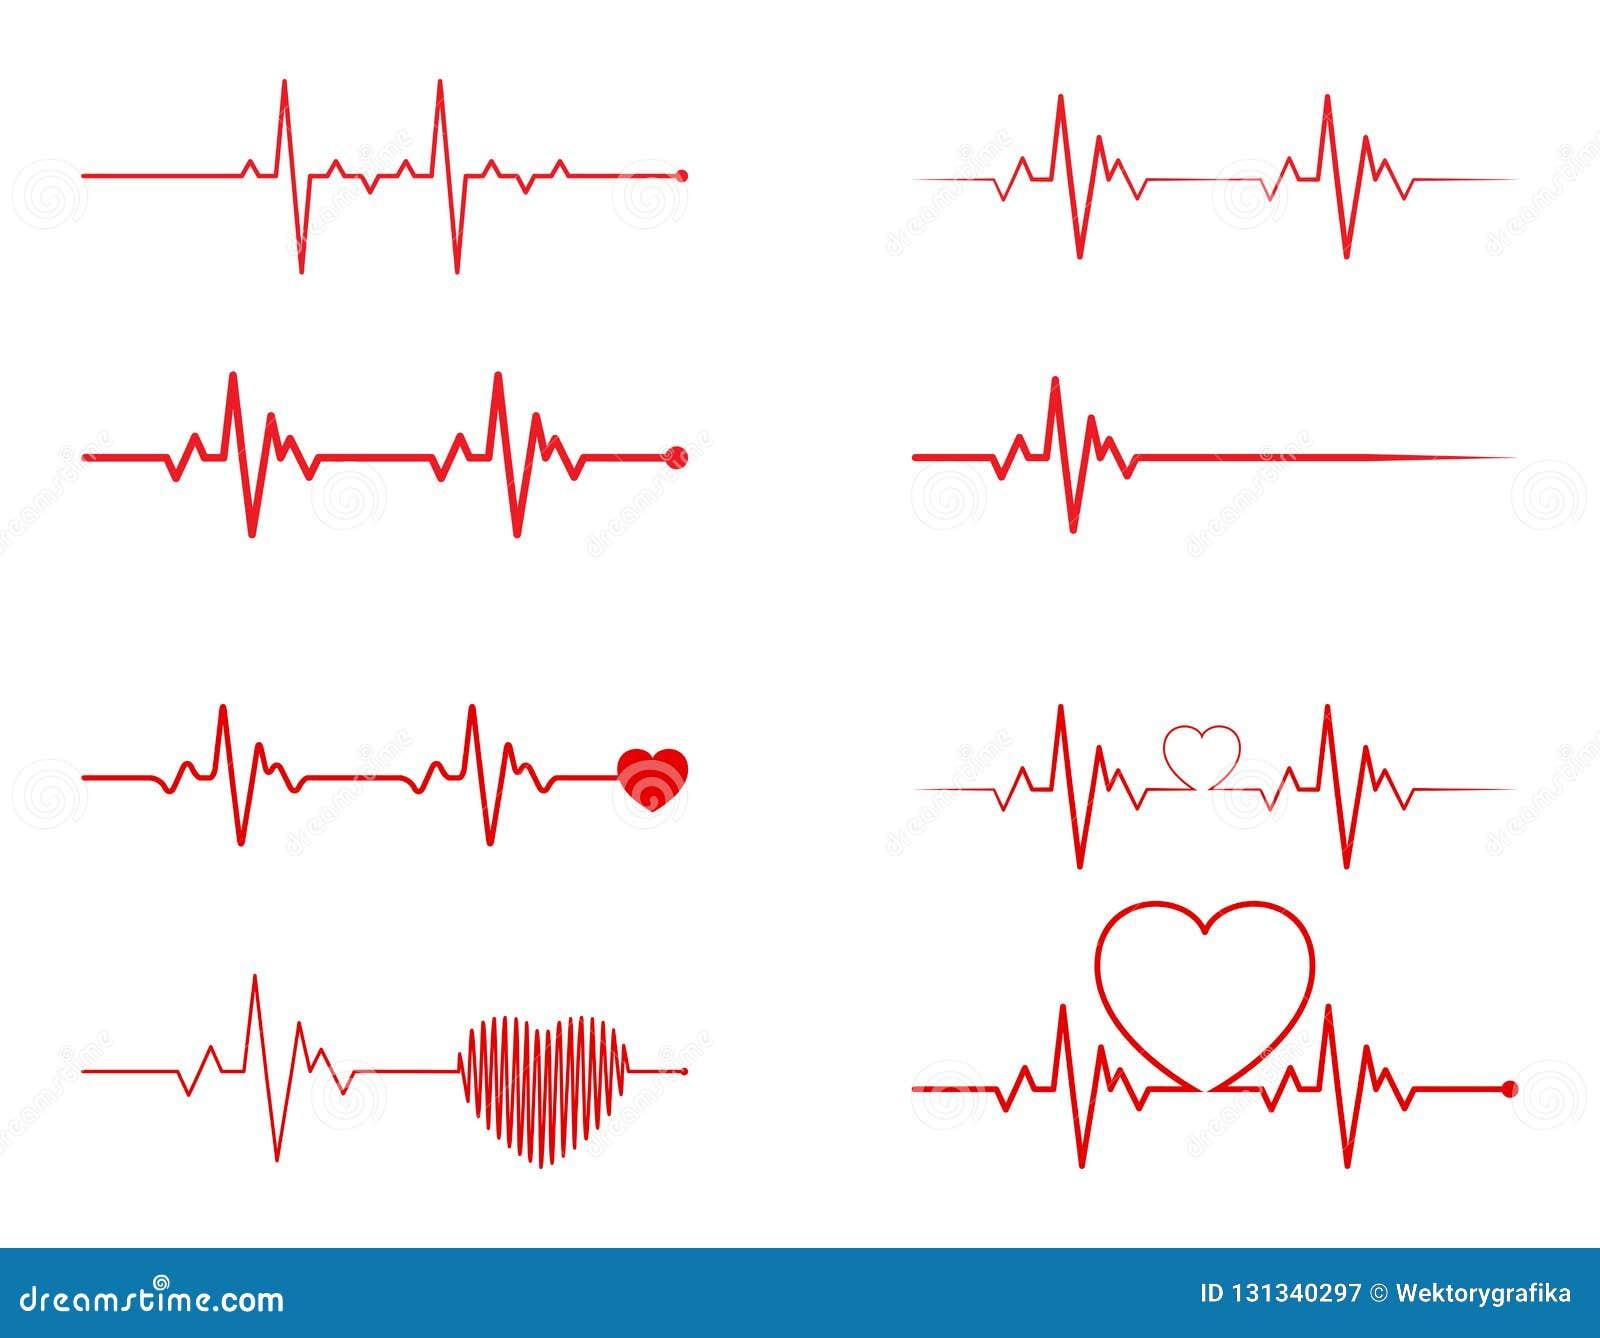 heart rhythm set, Electrocardiogram, ECG - EKG signal, Heart Beat pulse line concept design isolated on white background